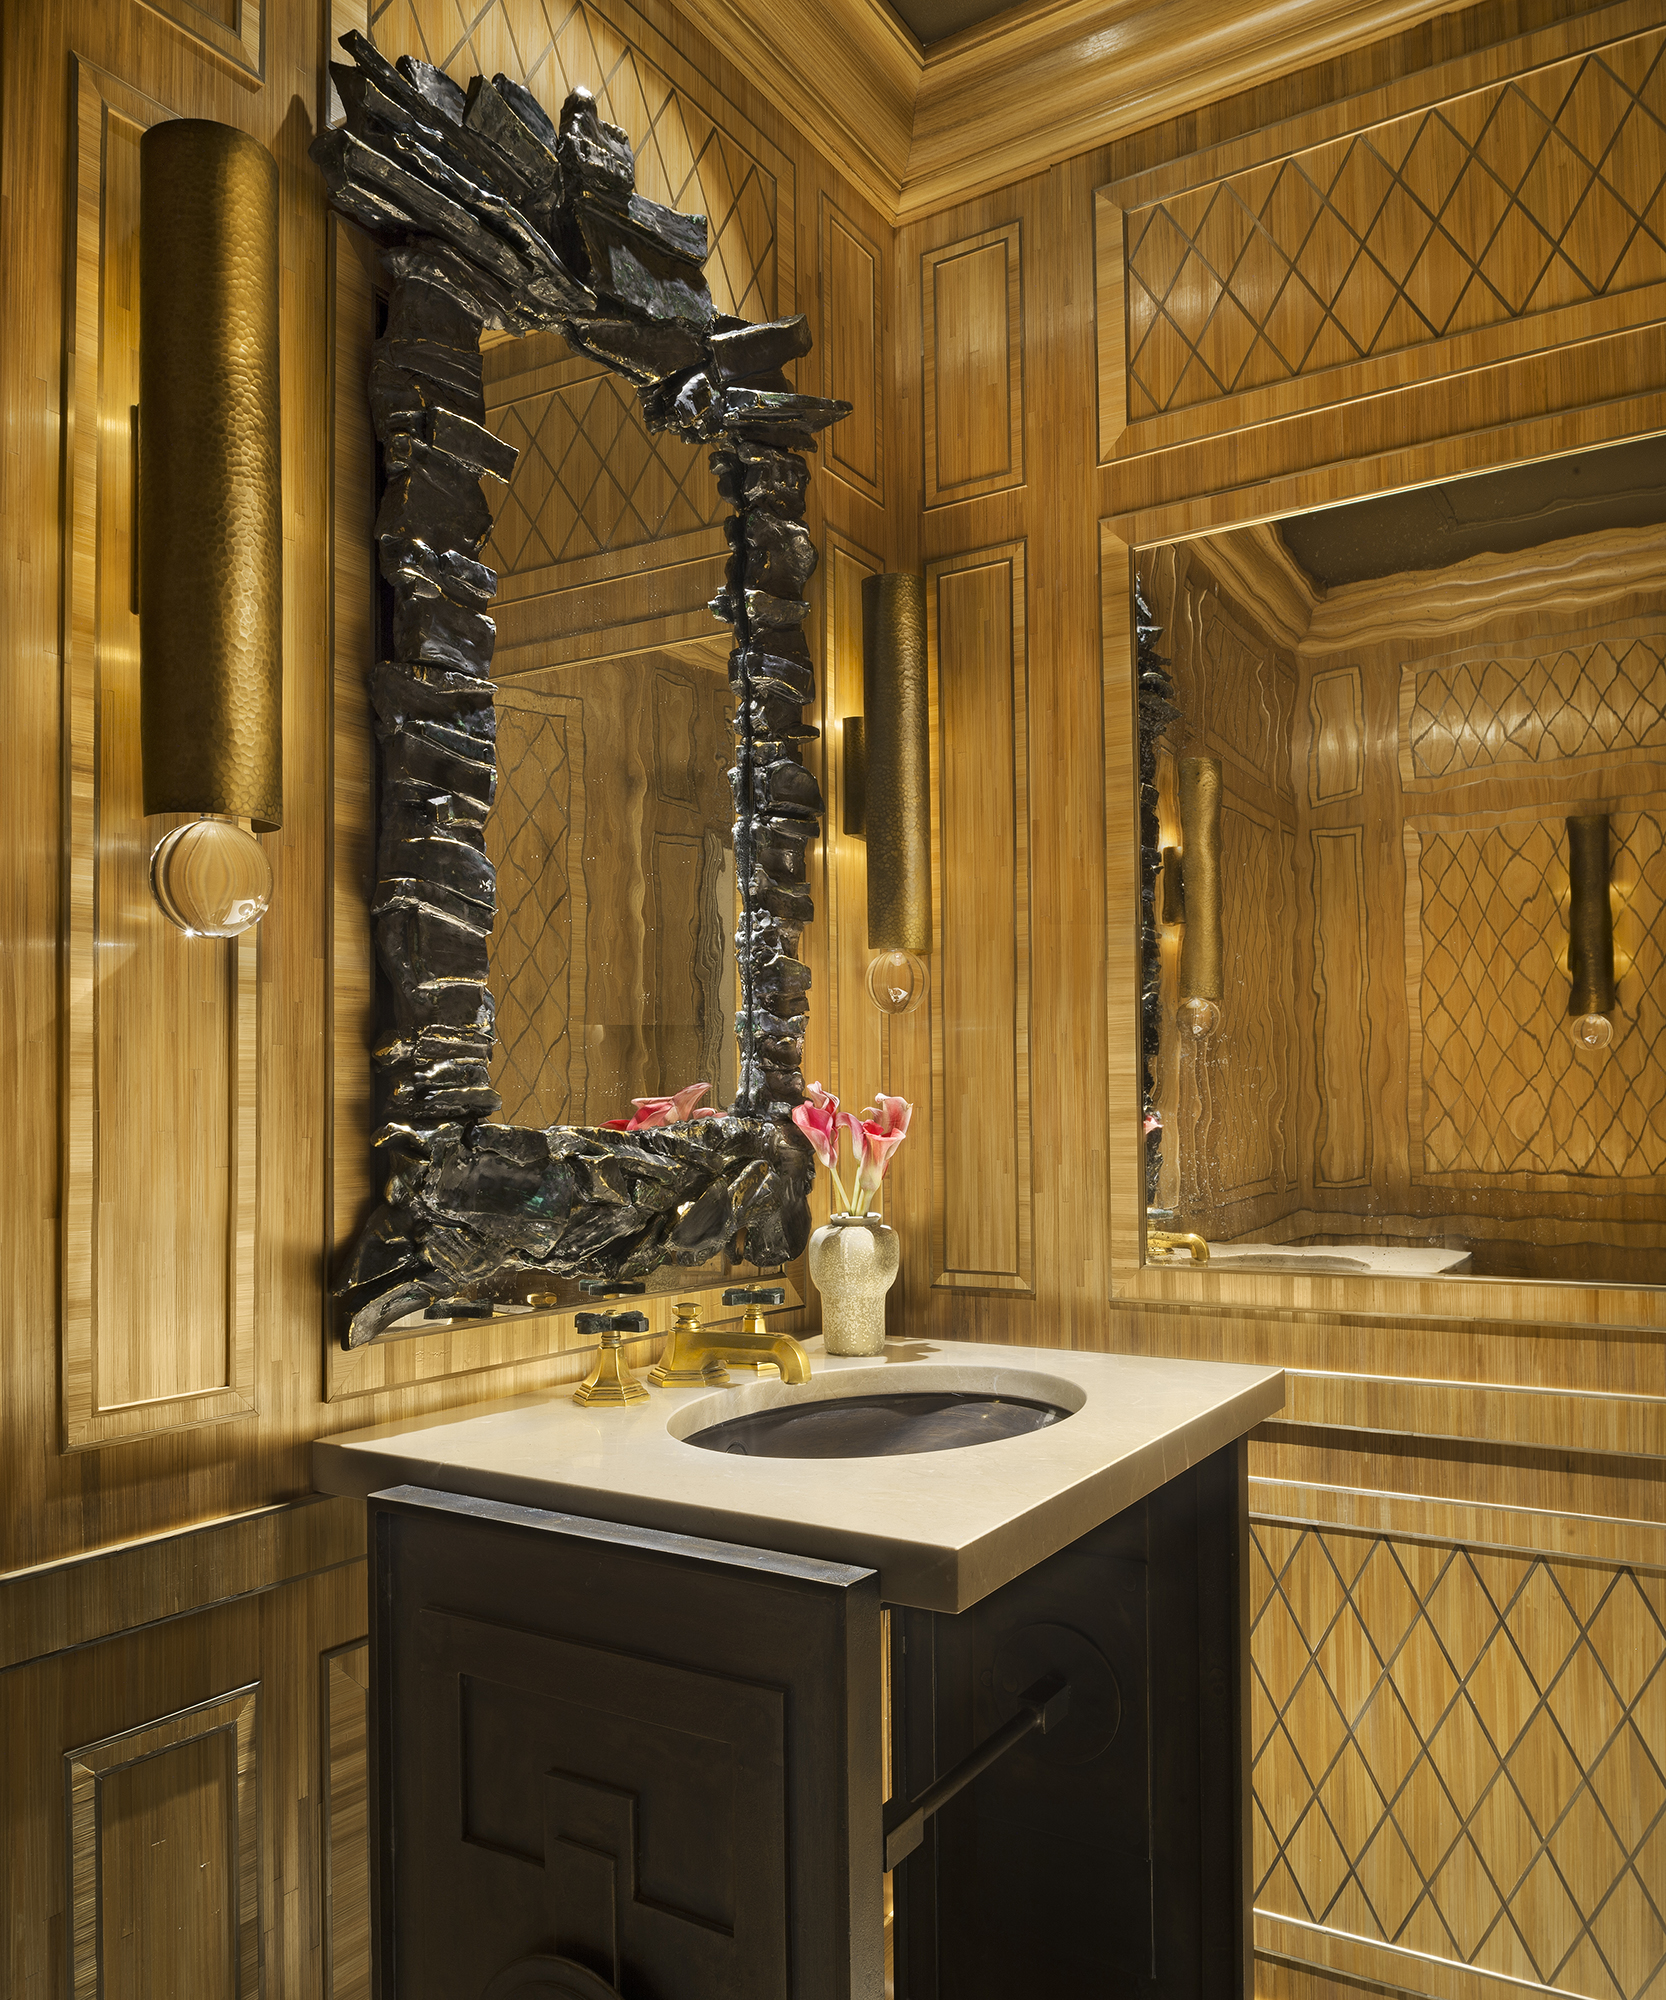 Luxueuse salle de bain au 740 Park Avenue, NY